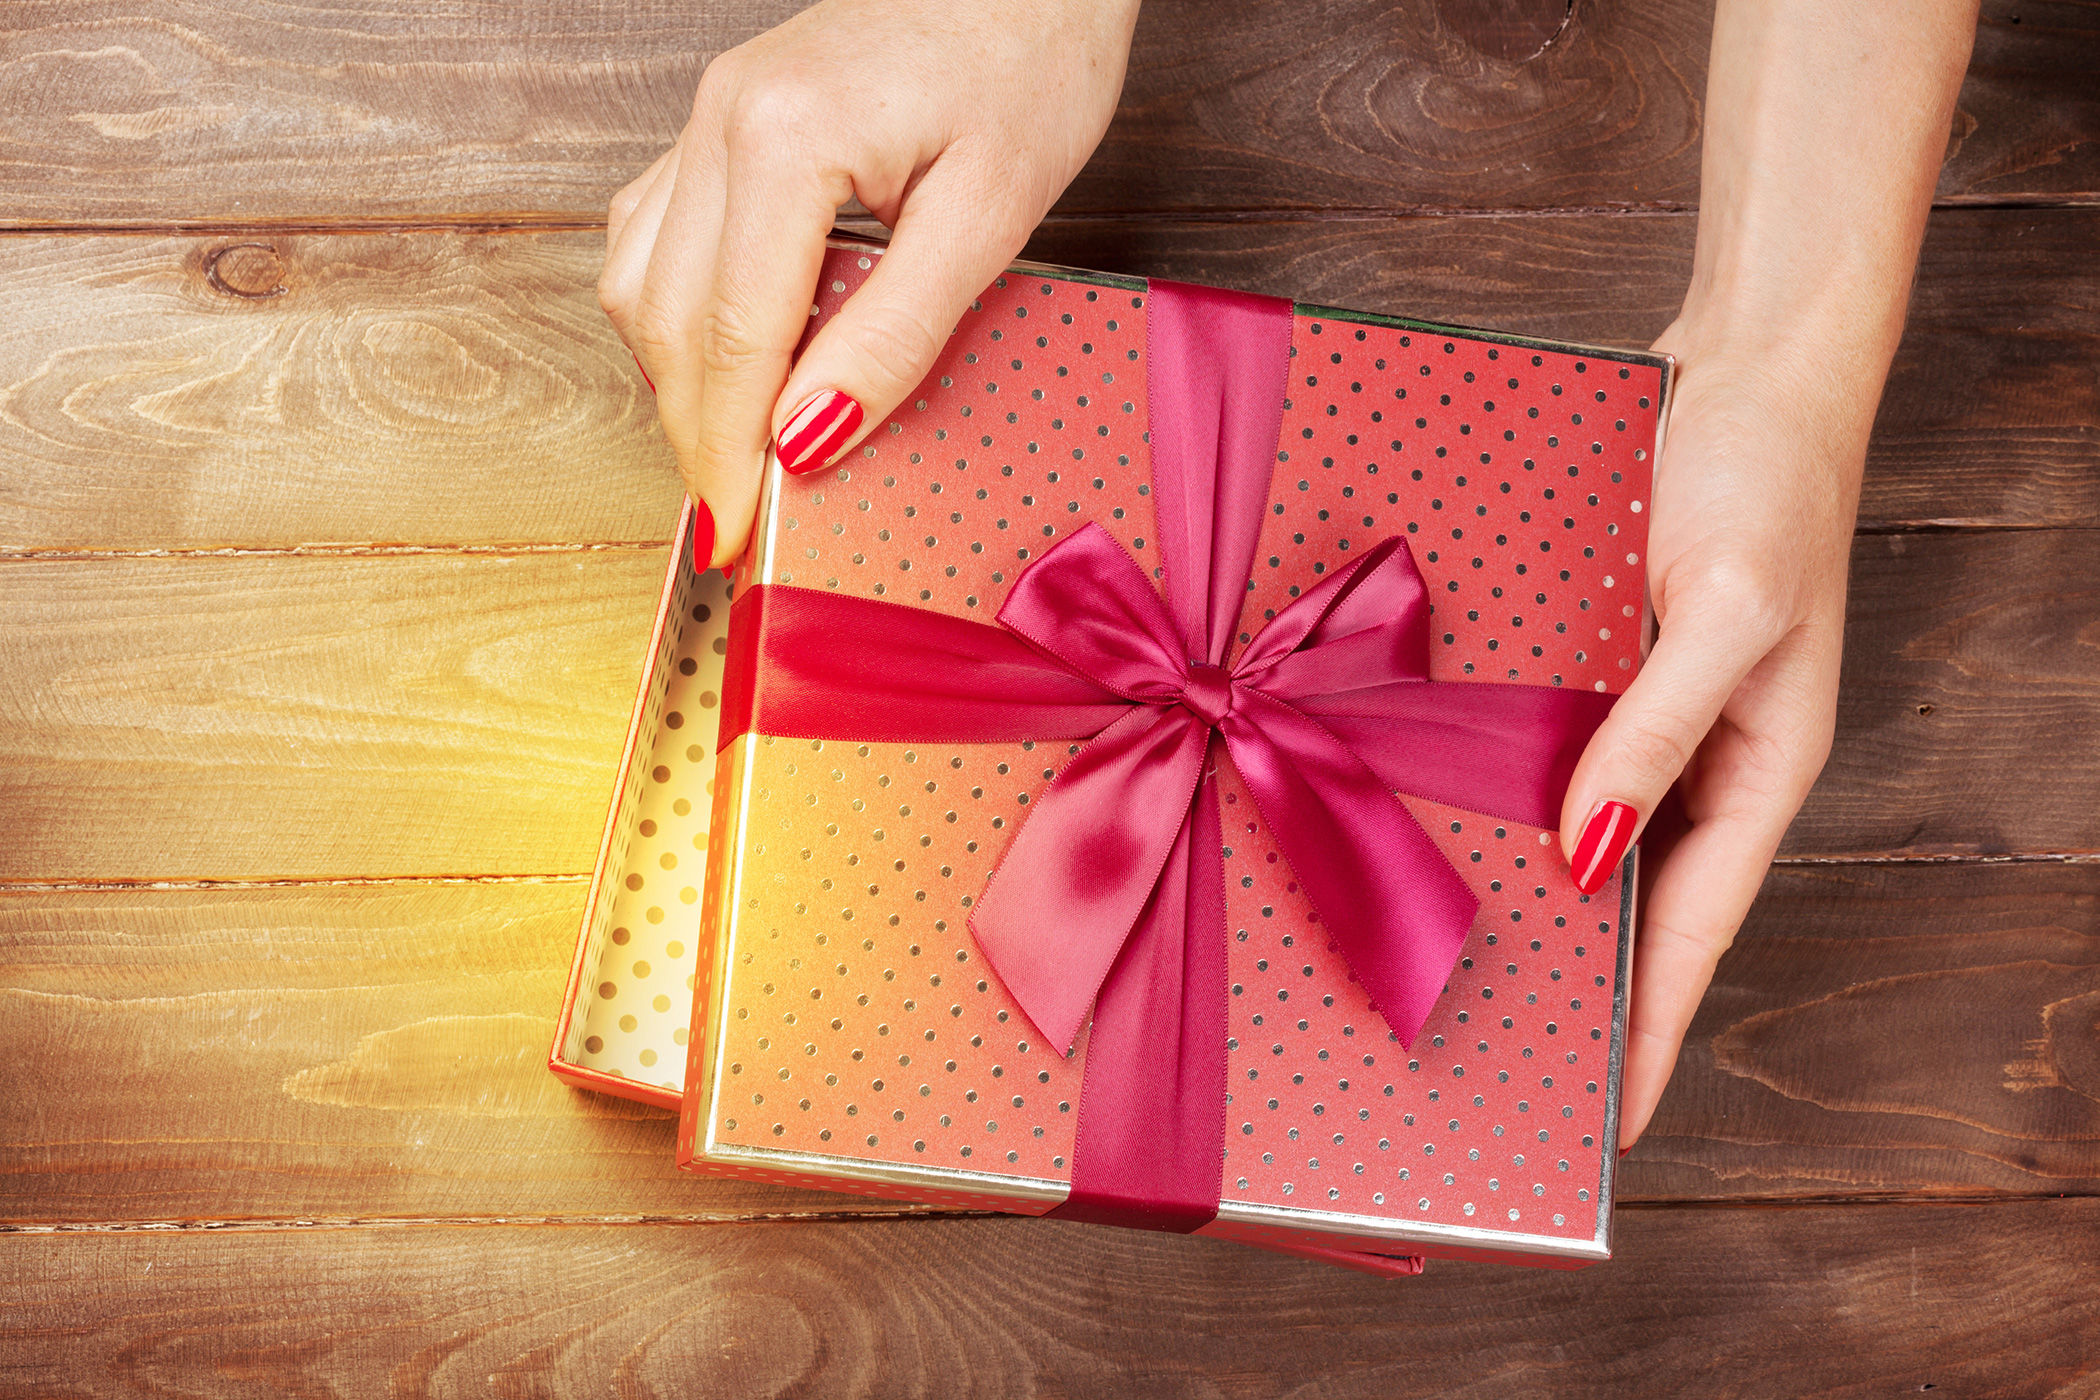 mettez de la beaut dans vos id es cadeaux de no l idee cadeau original. Black Bedroom Furniture Sets. Home Design Ideas